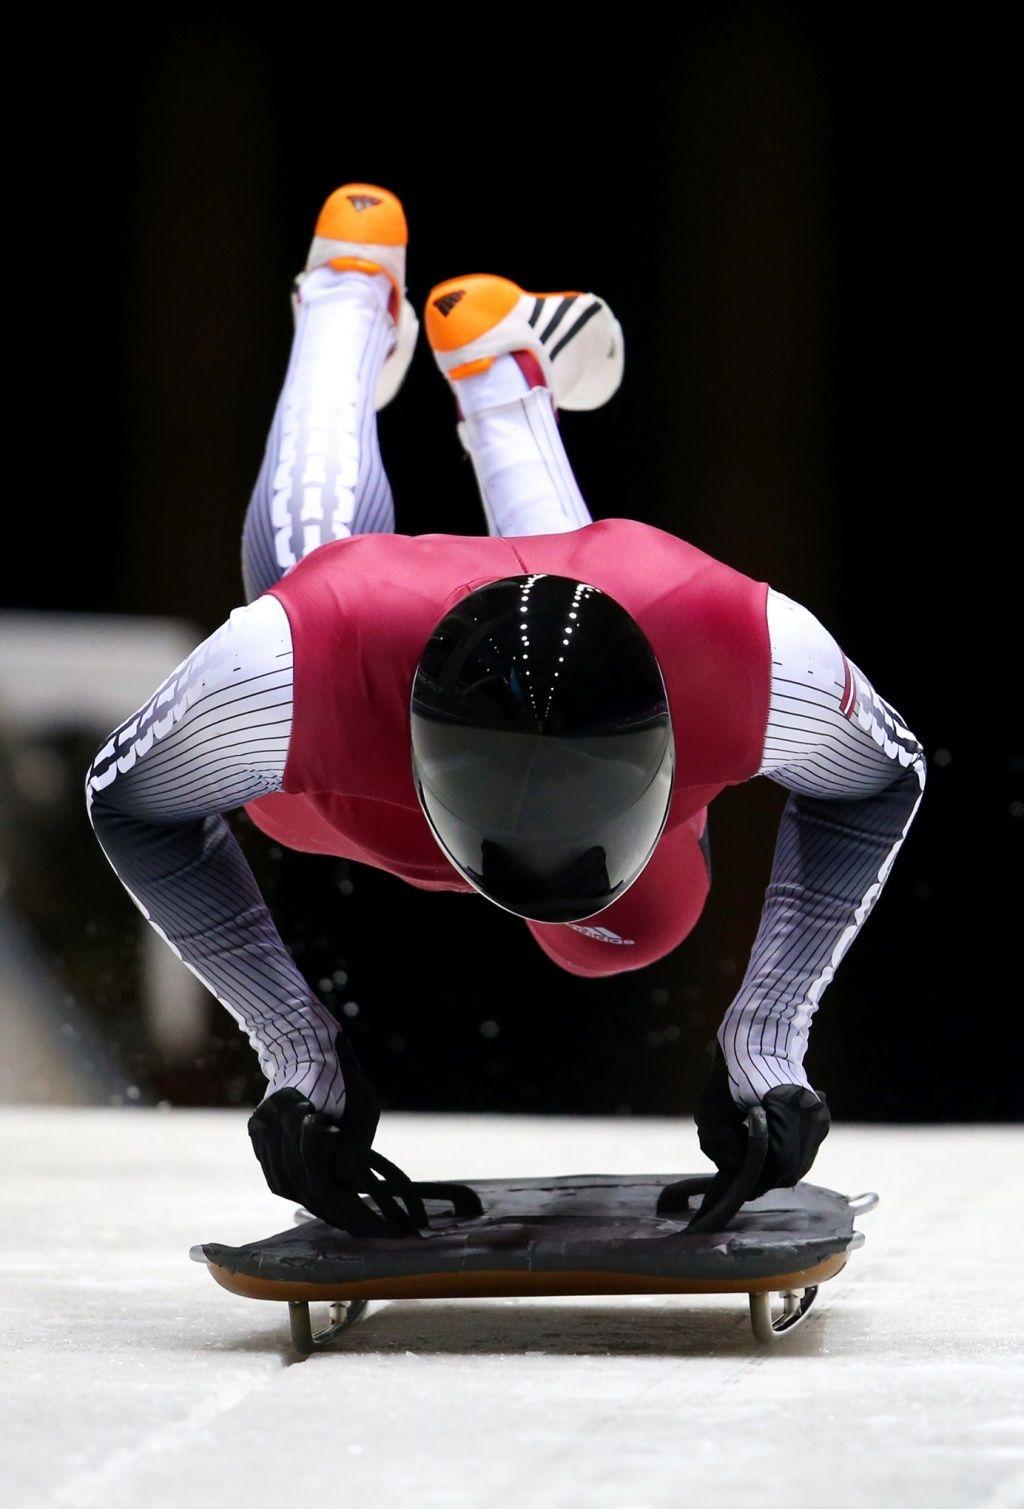 Sochi 2014 10 amazing helmet designs at the Winter